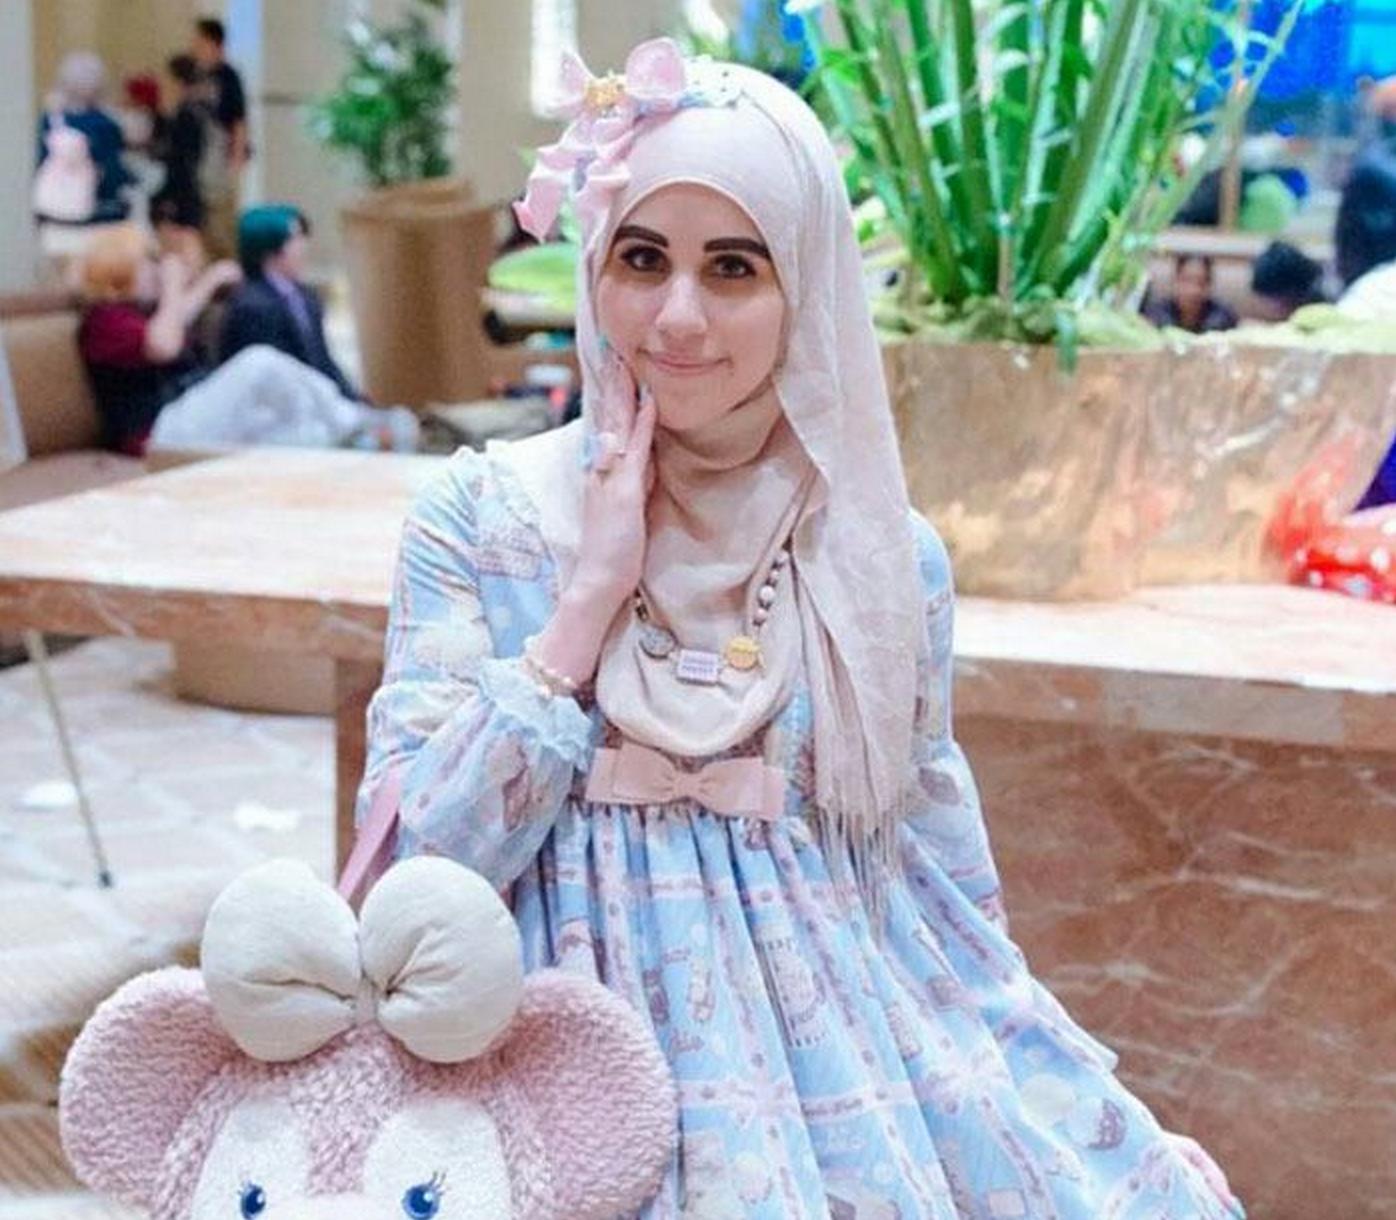 Fashion Beauty Inc: Trend Watch: The Hottest Muslim Lolita Street Style Snaps